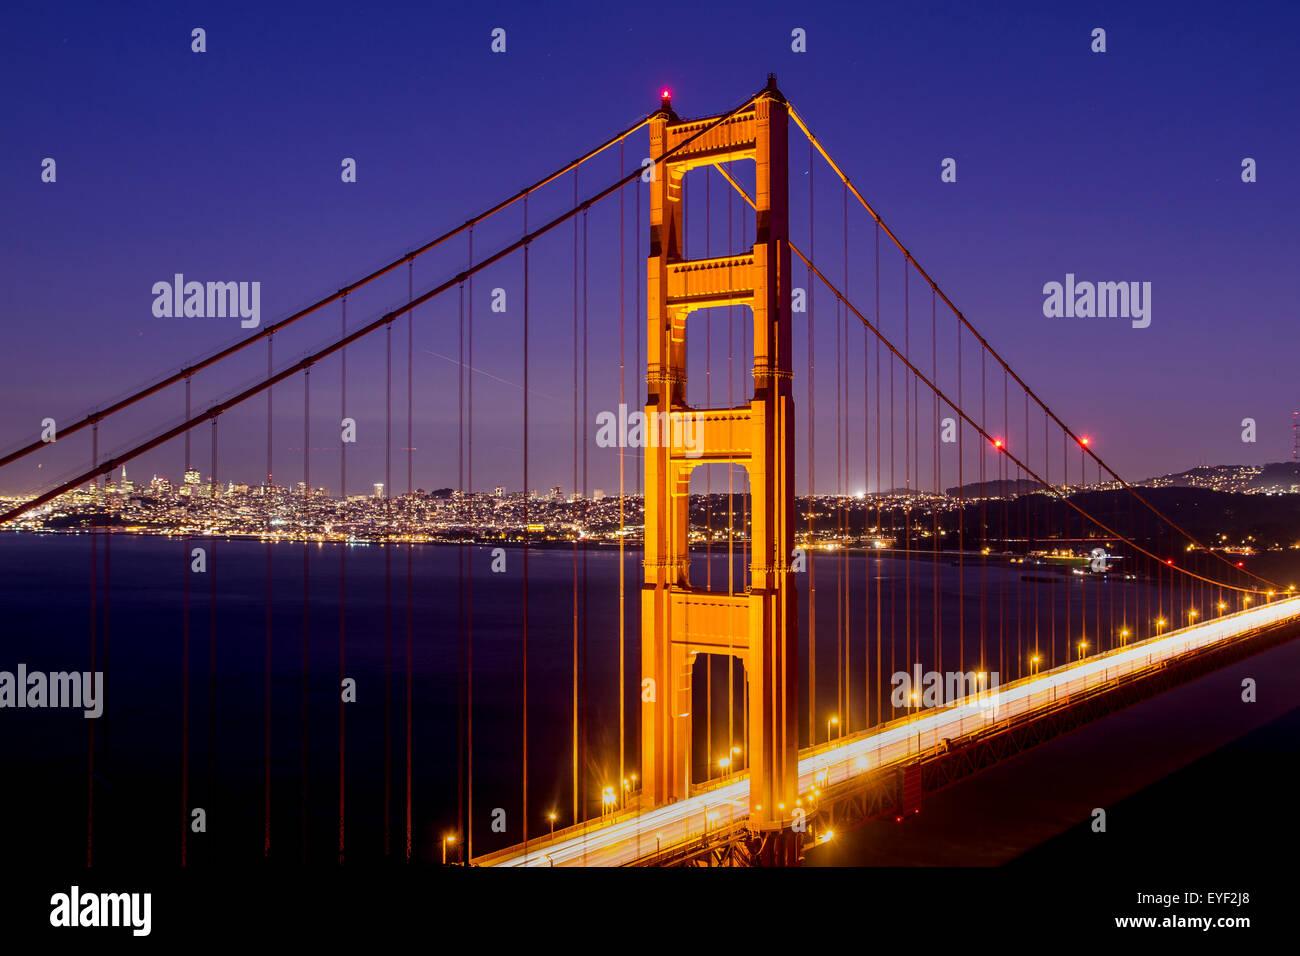 Le Golden Gate Bridge at night du Marin Headlands, San Francisco, Californie Banque D'Images